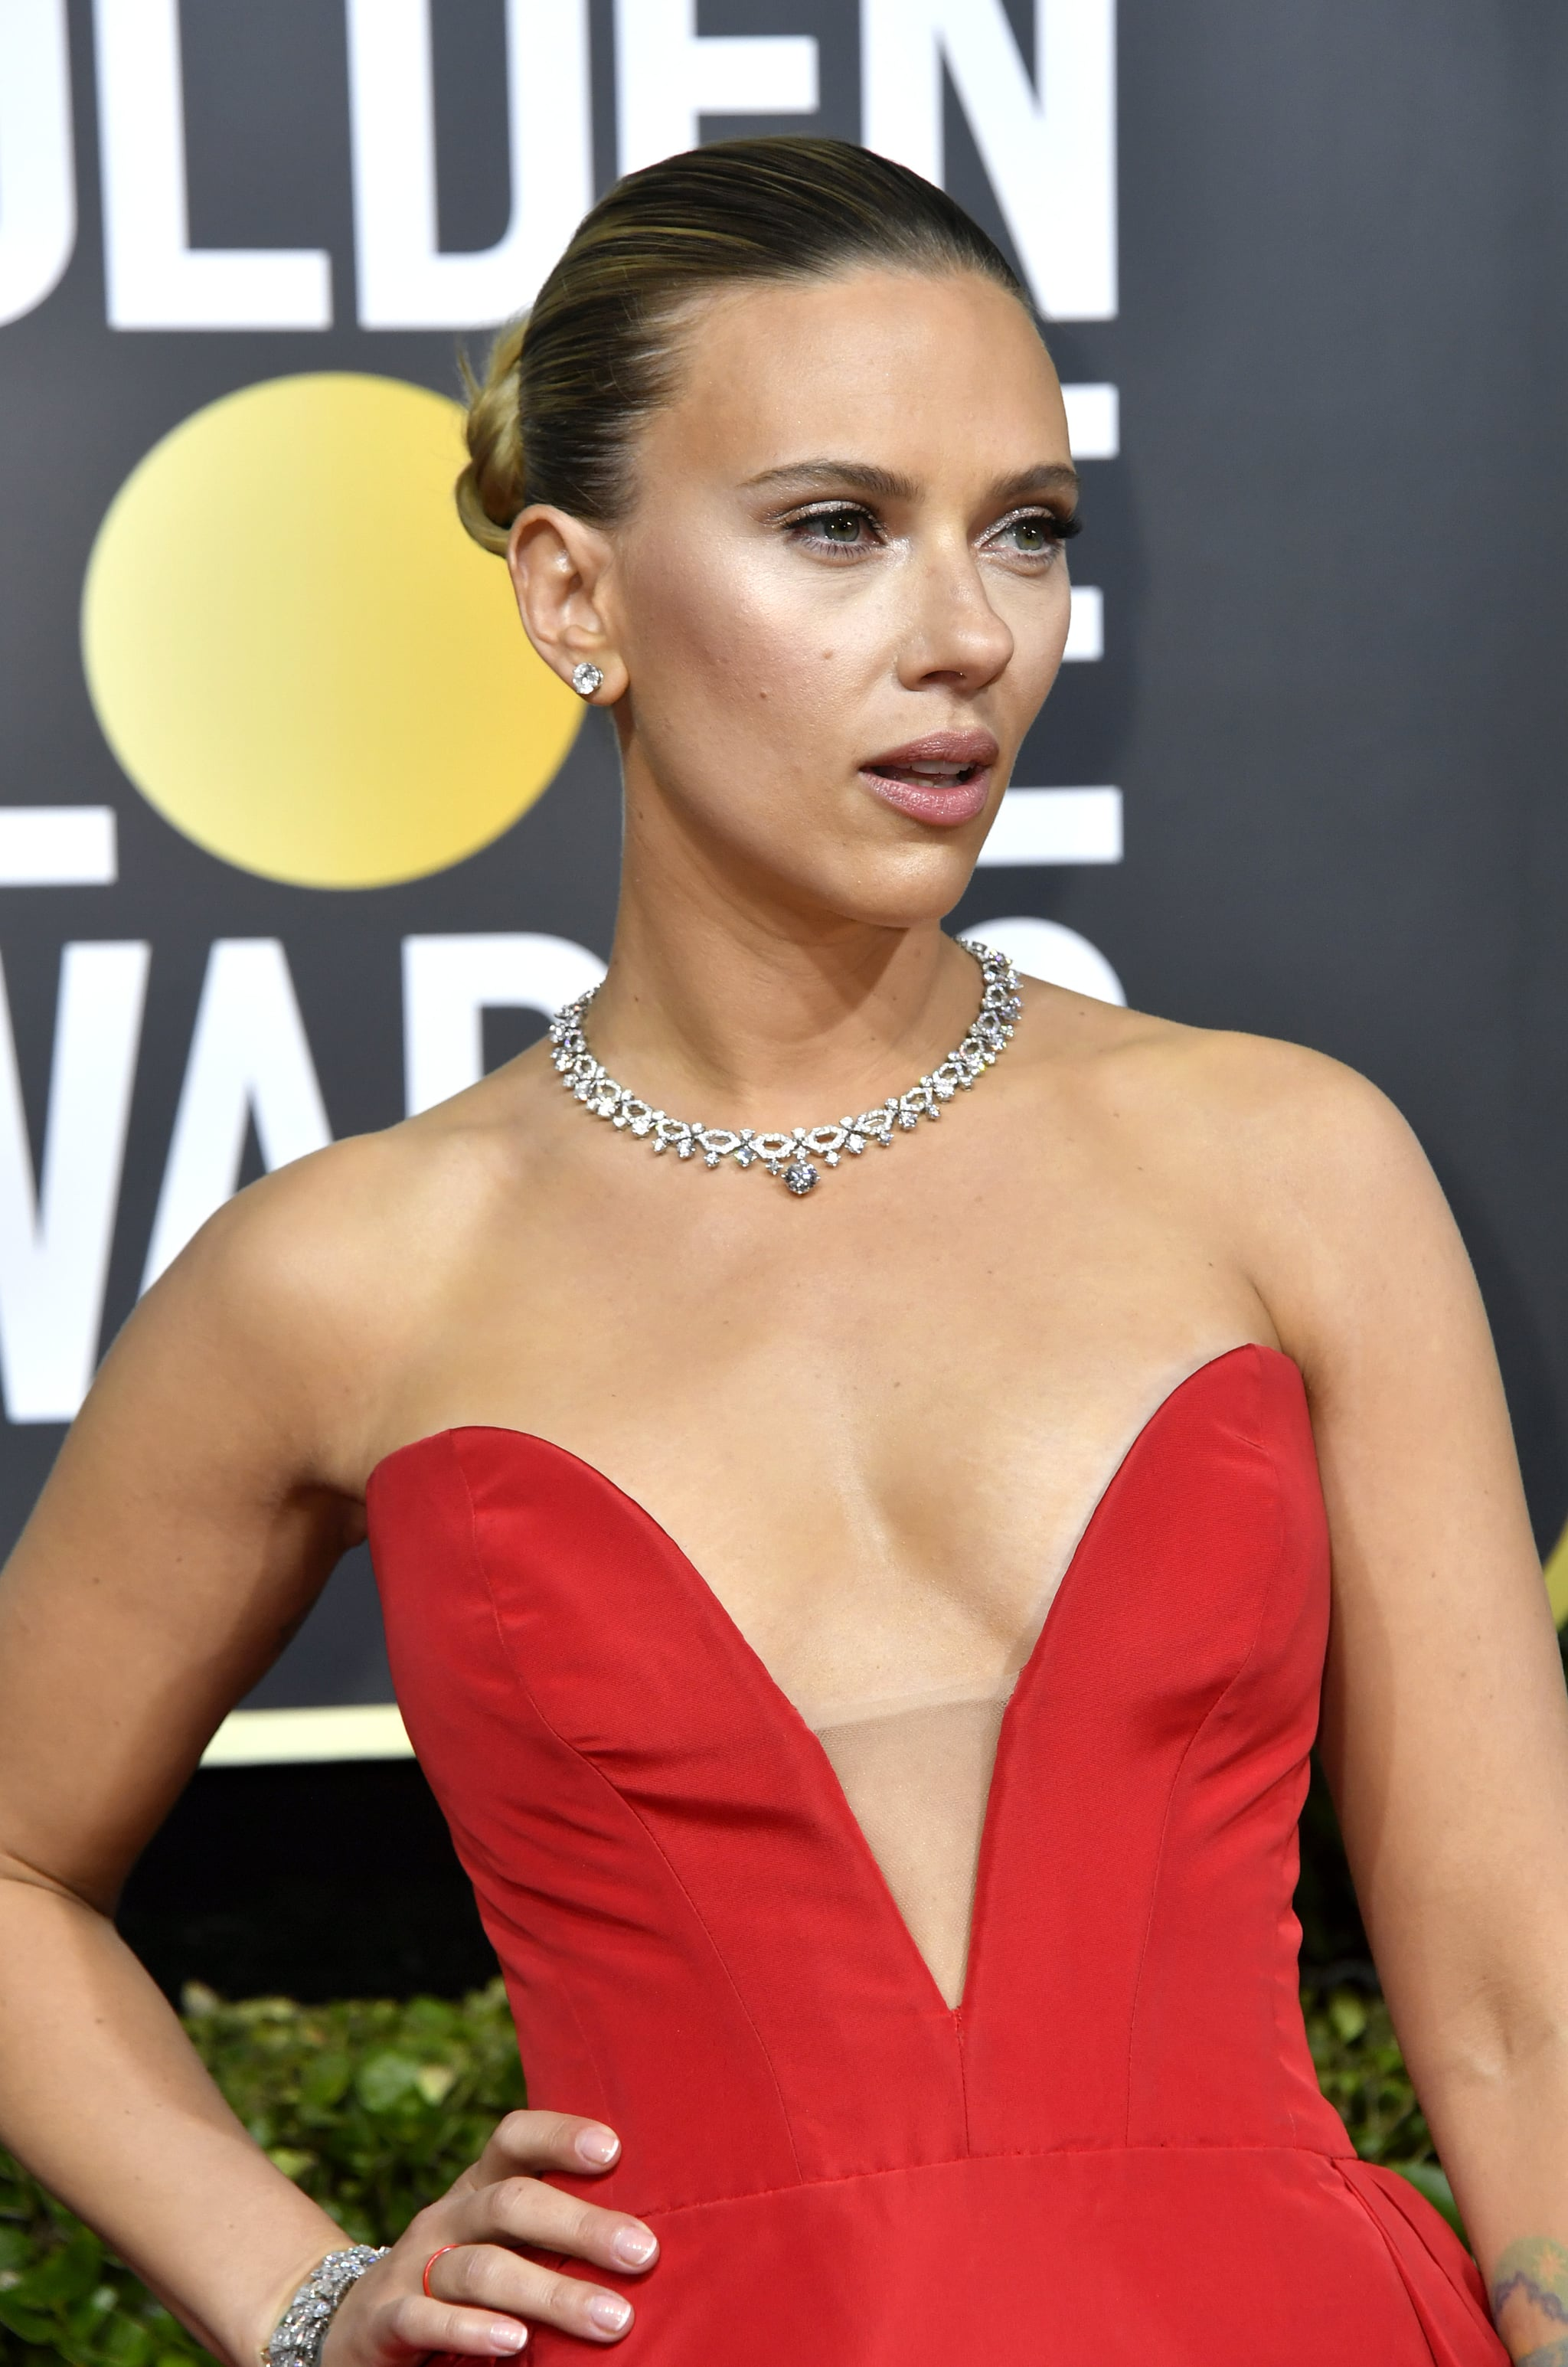 Scarlett Johansson At The 2020 Golden Globes The Sexiest Looks At The Golden Globes 2020 Popsugar Fashion Australia Photo 5